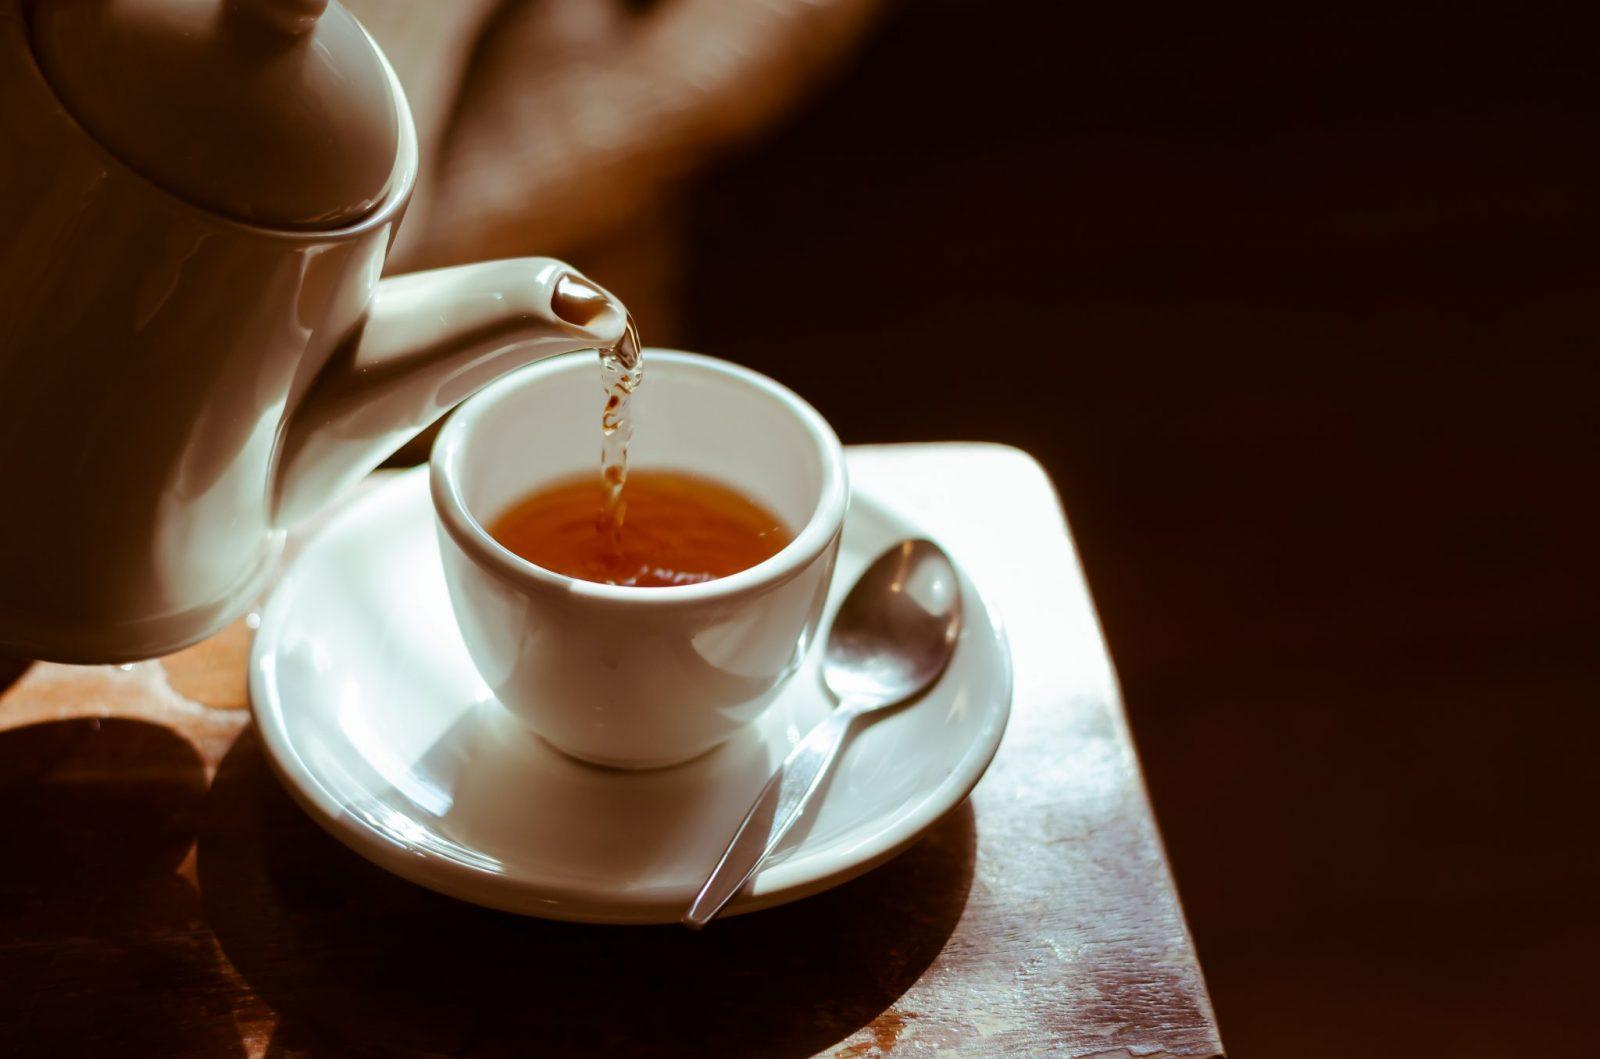 Benefits of Green tea and Black tea